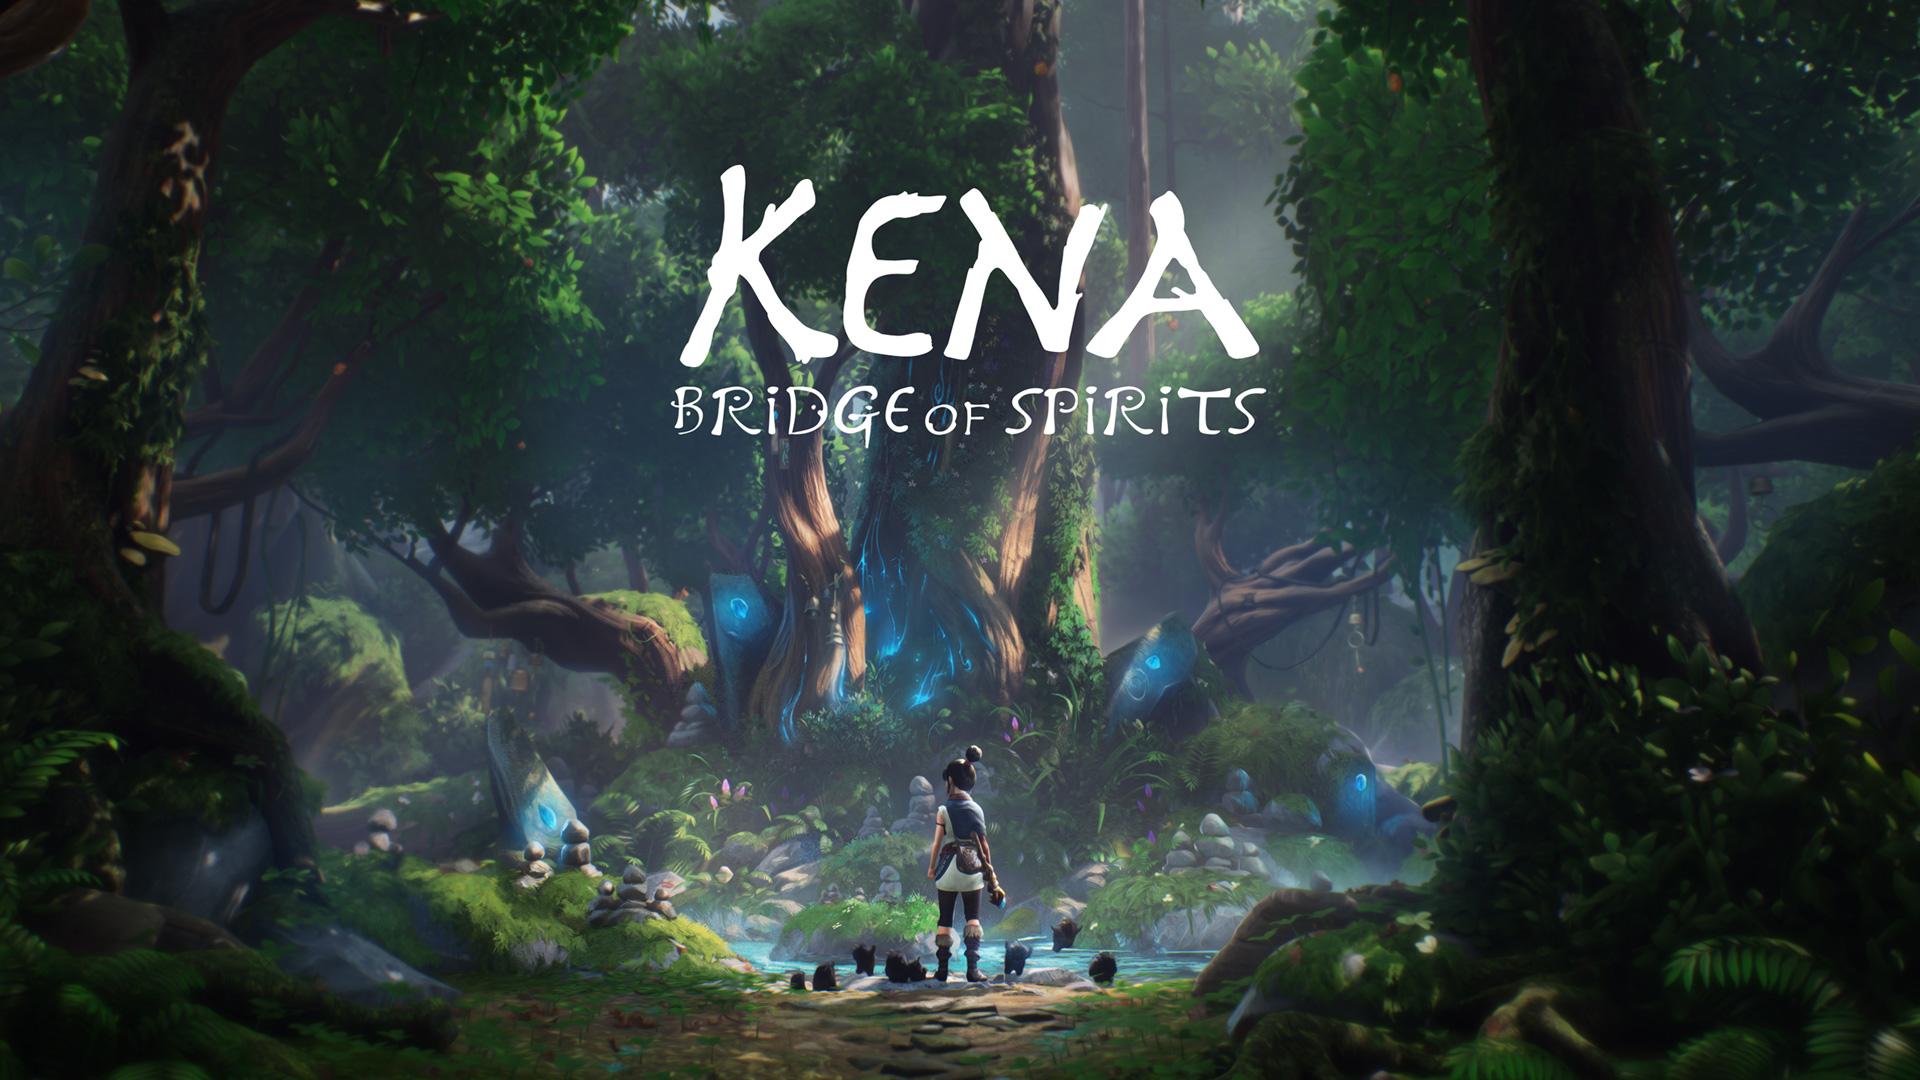 Kena: Bridge Of Spirits выходит 21 сентября (EGS KenaBridgeofSpirits EmberLab S5 1920x1080 450356496c568d85ecc7319a202b99b7)